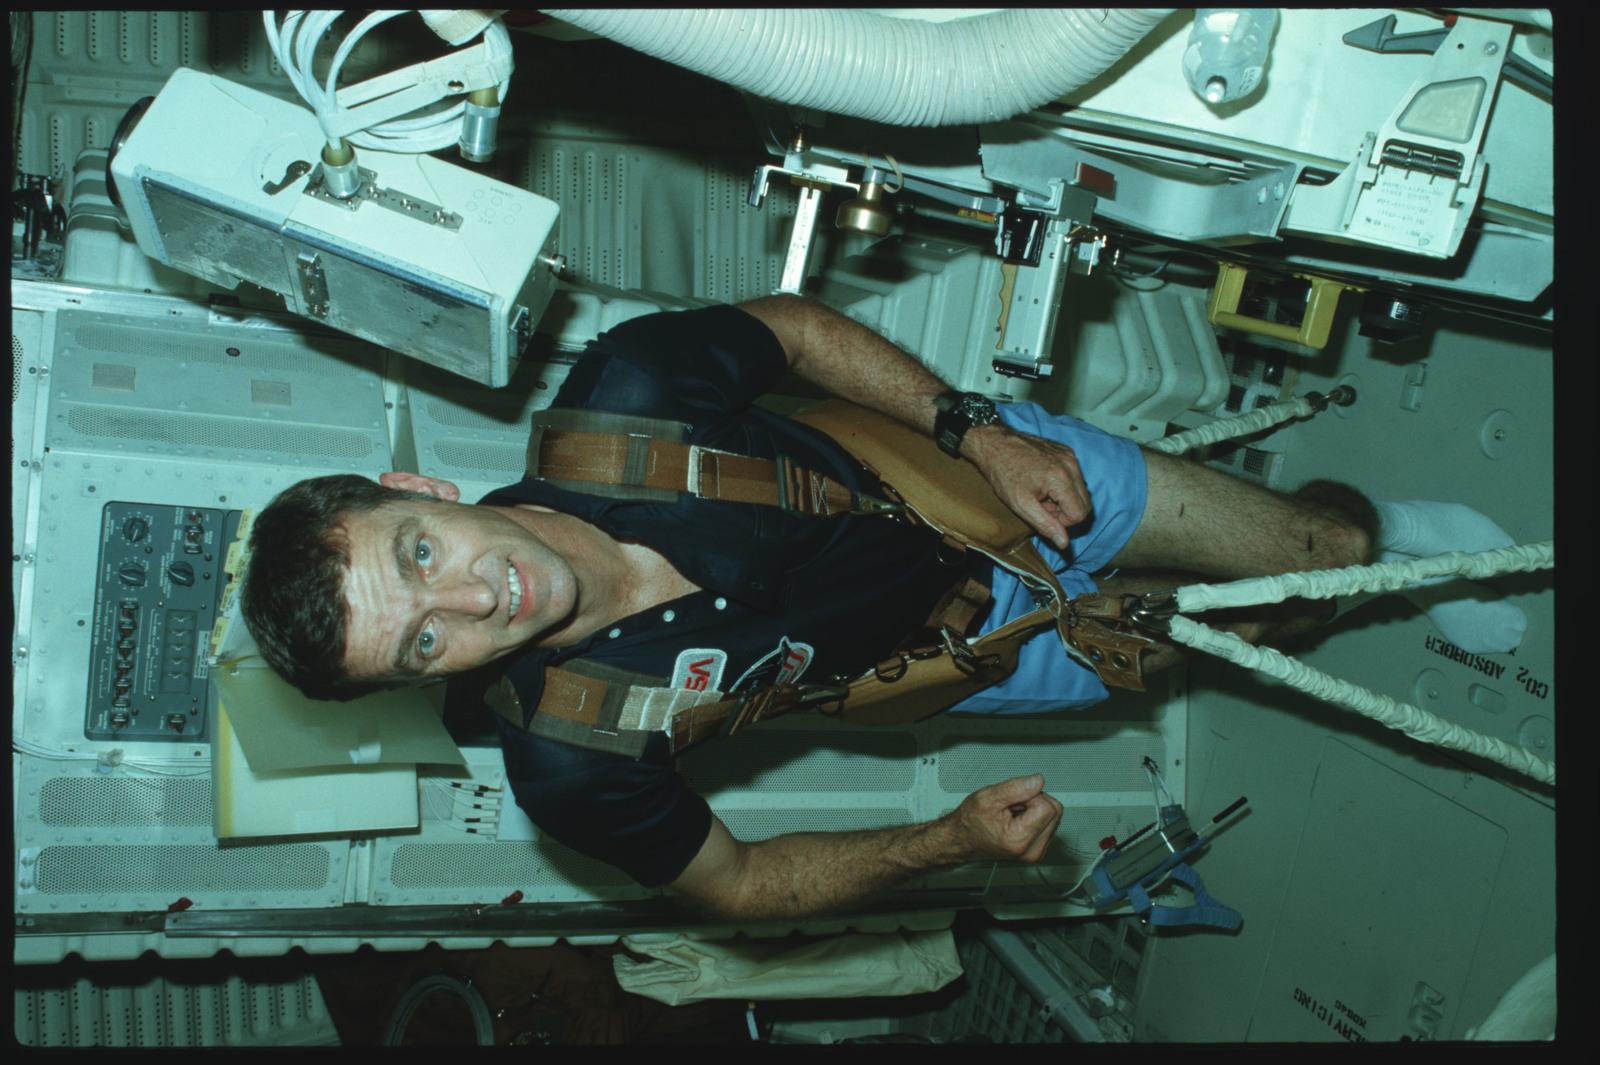 S02-02-884 - STS-002 - Commander Engle exercises on middeck using exerciser restraint harness